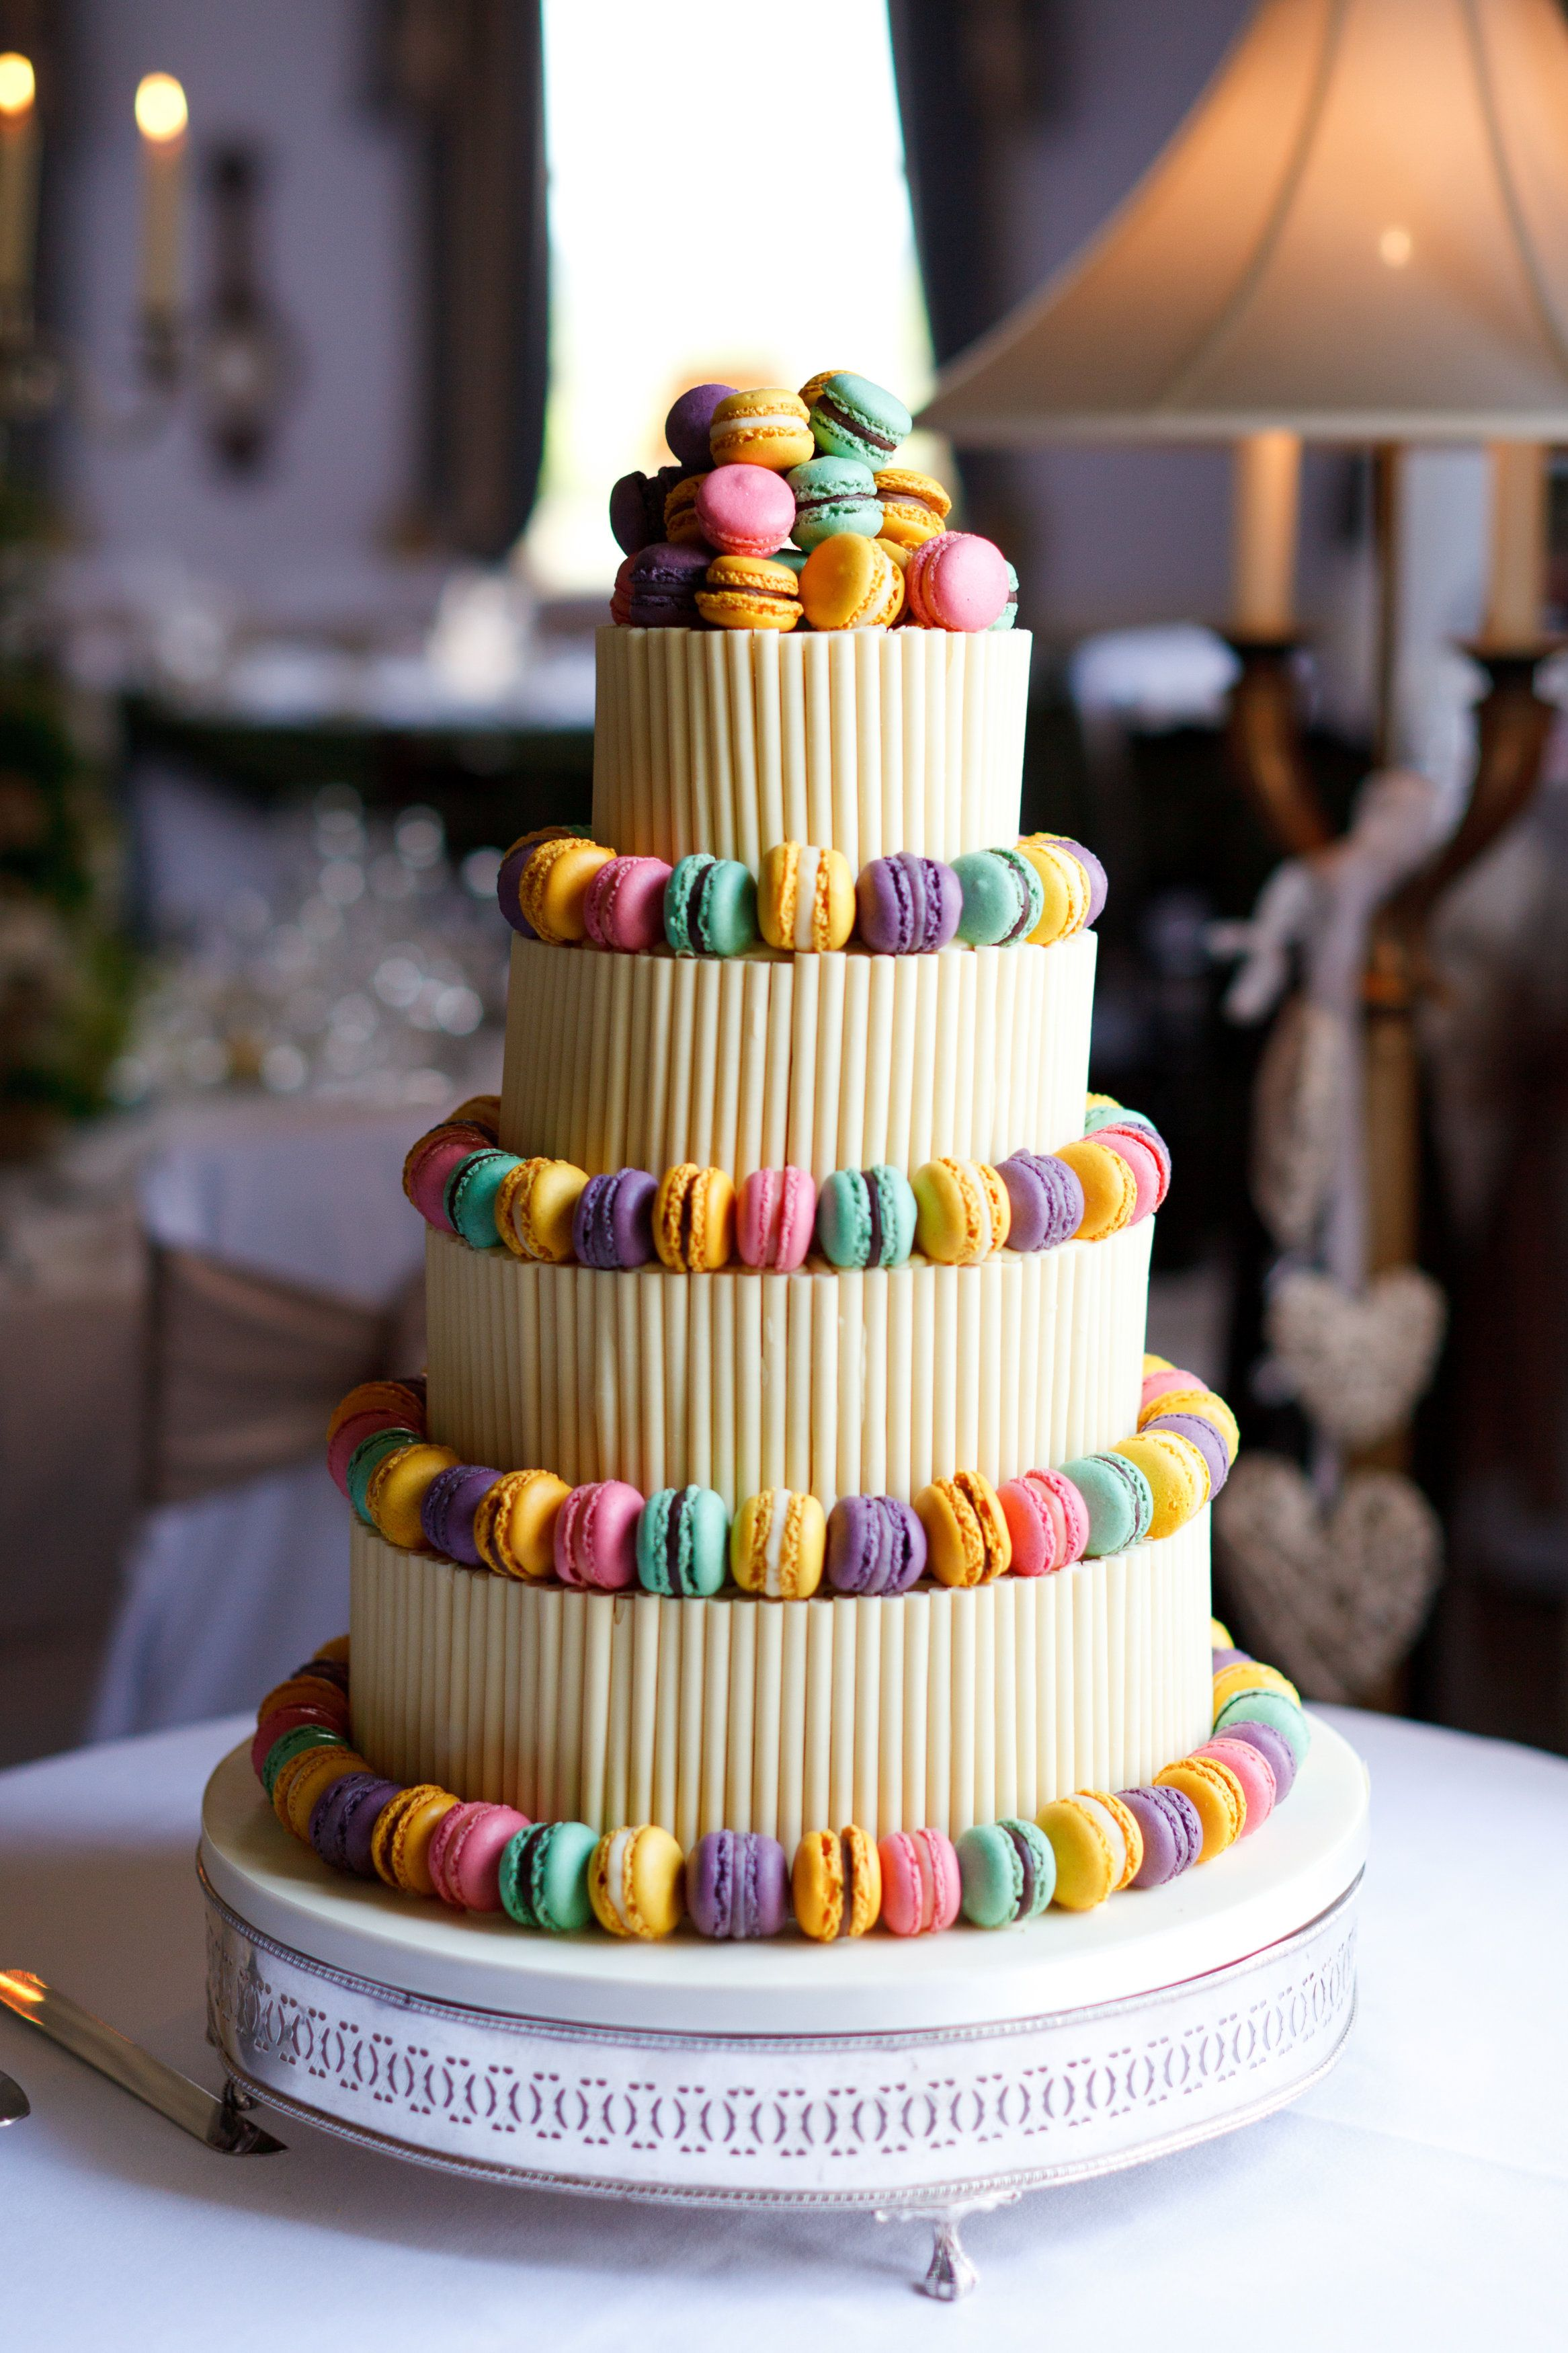 Fun And Colourful Creative Wedding Cake Idea For Your